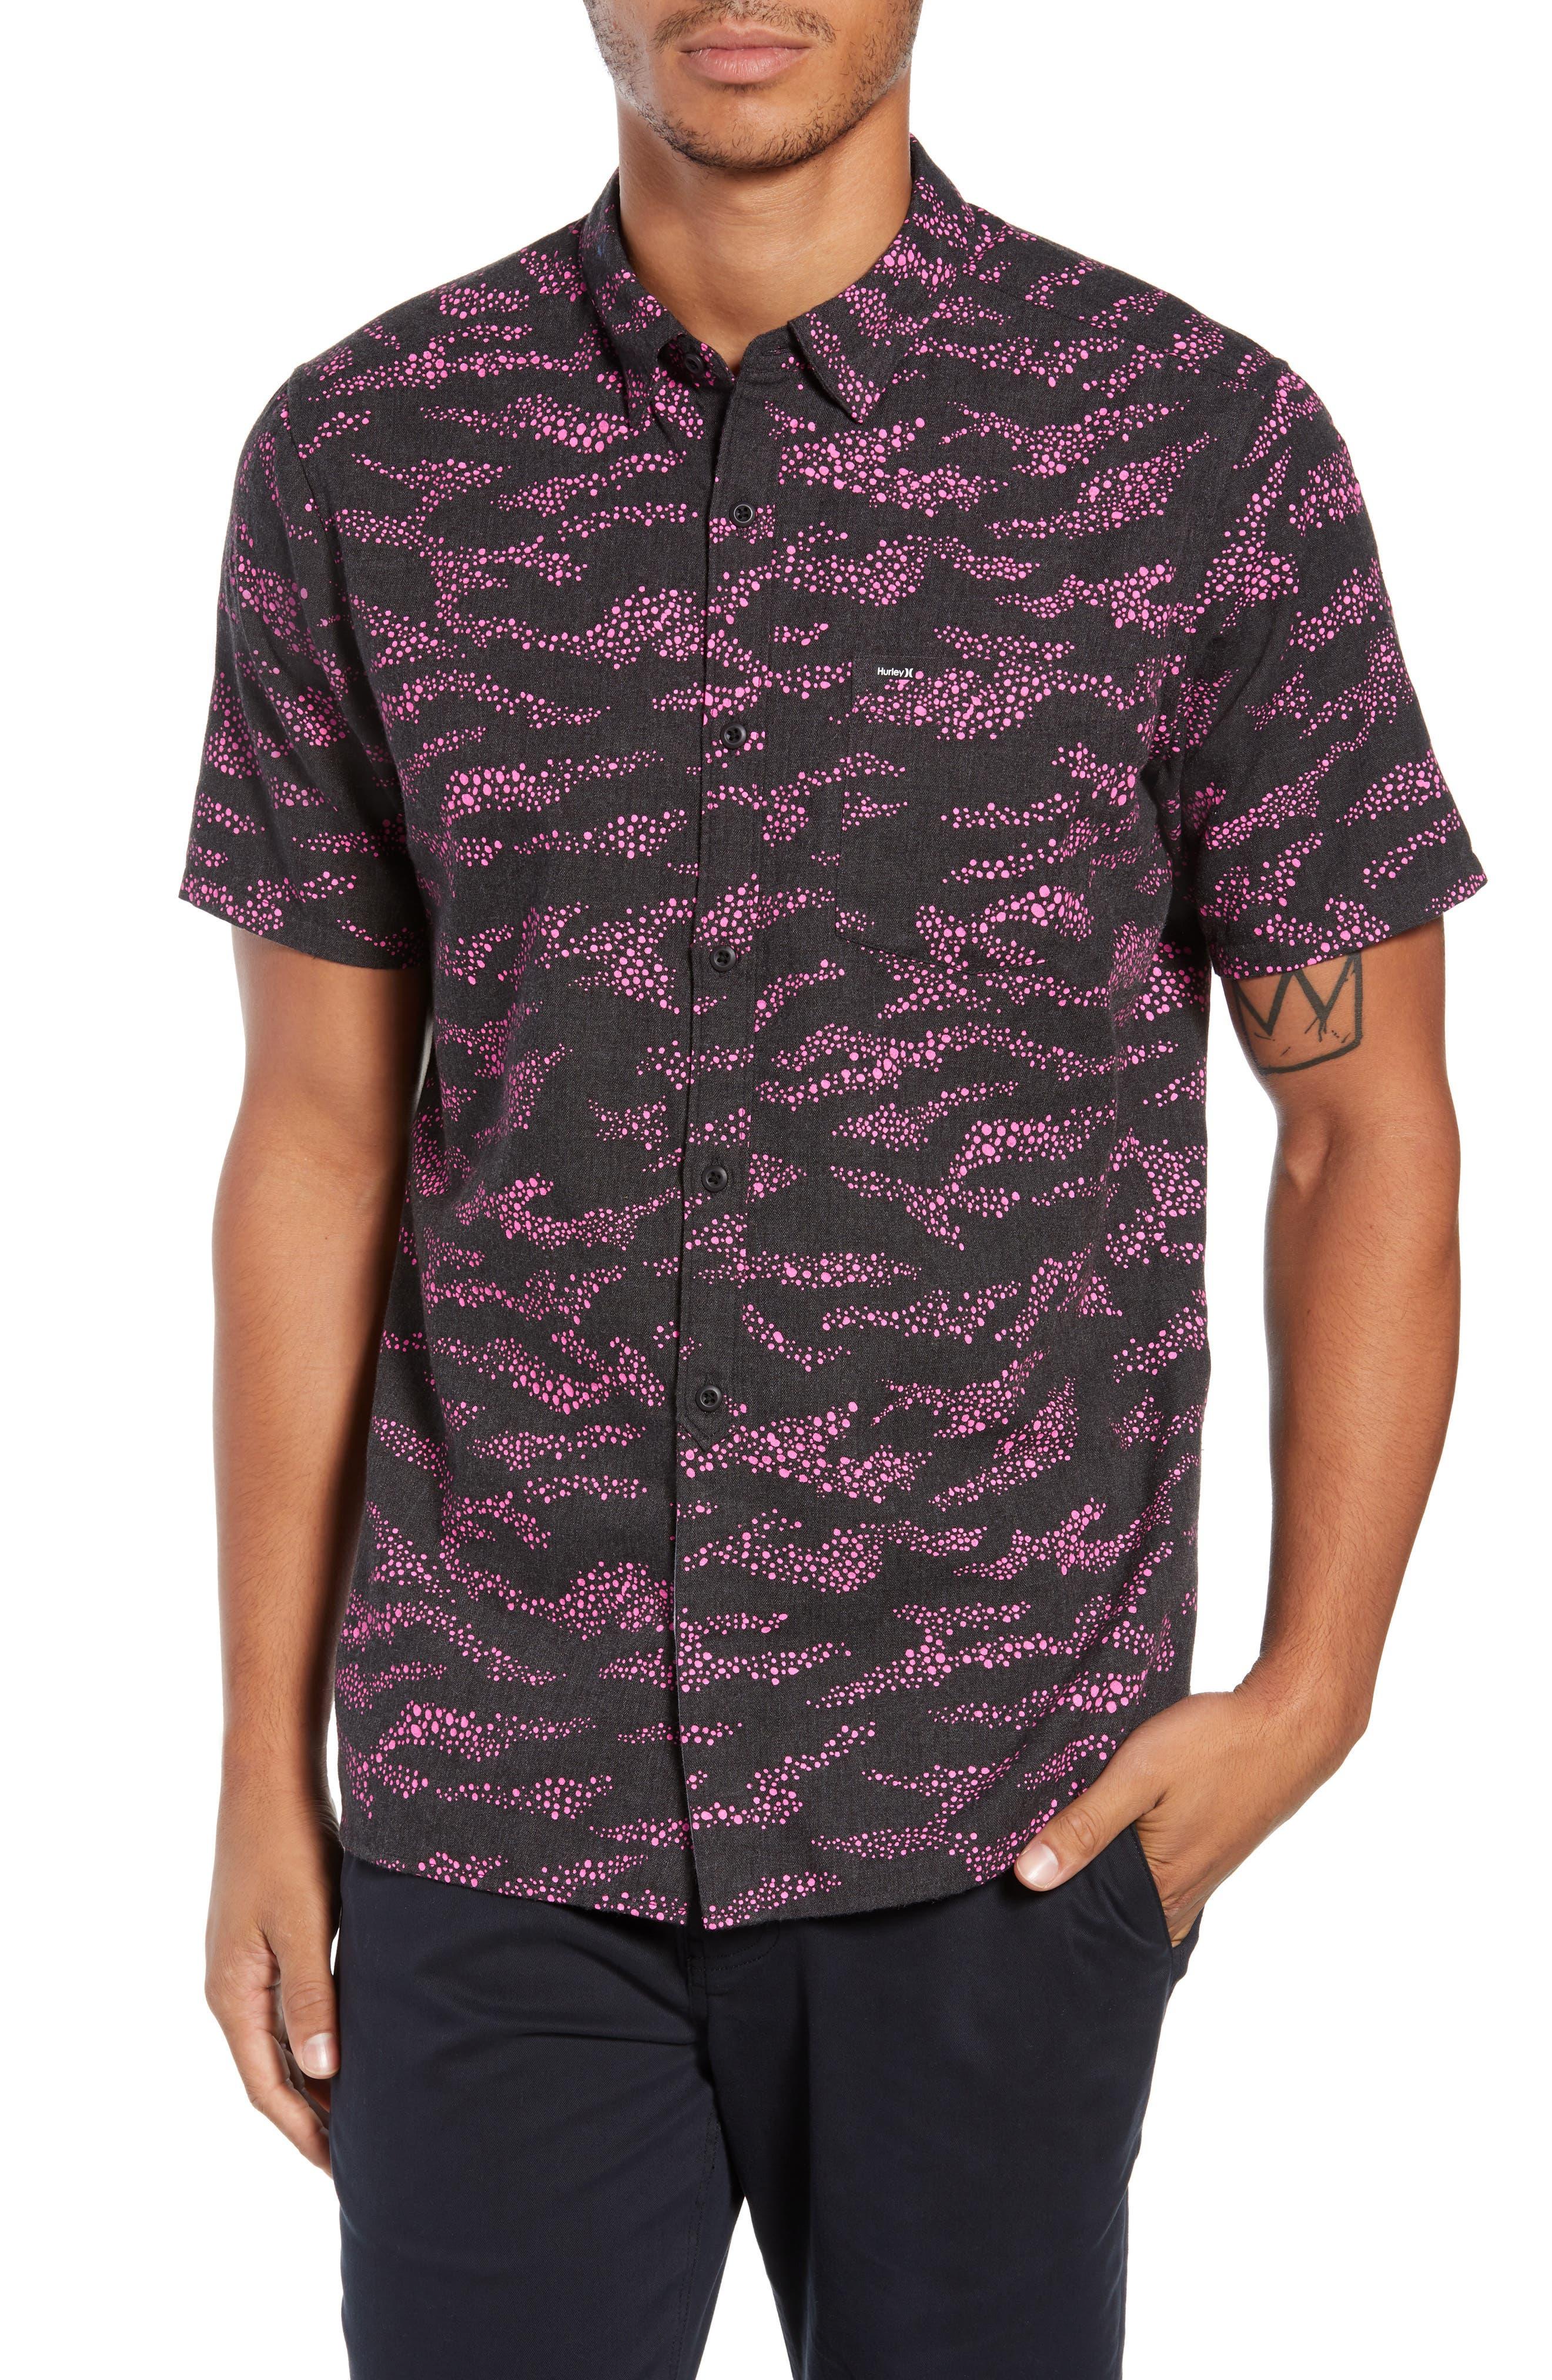 Outcast Woven Shirt,                             Main thumbnail 1, color,                             BLACK HEATHER